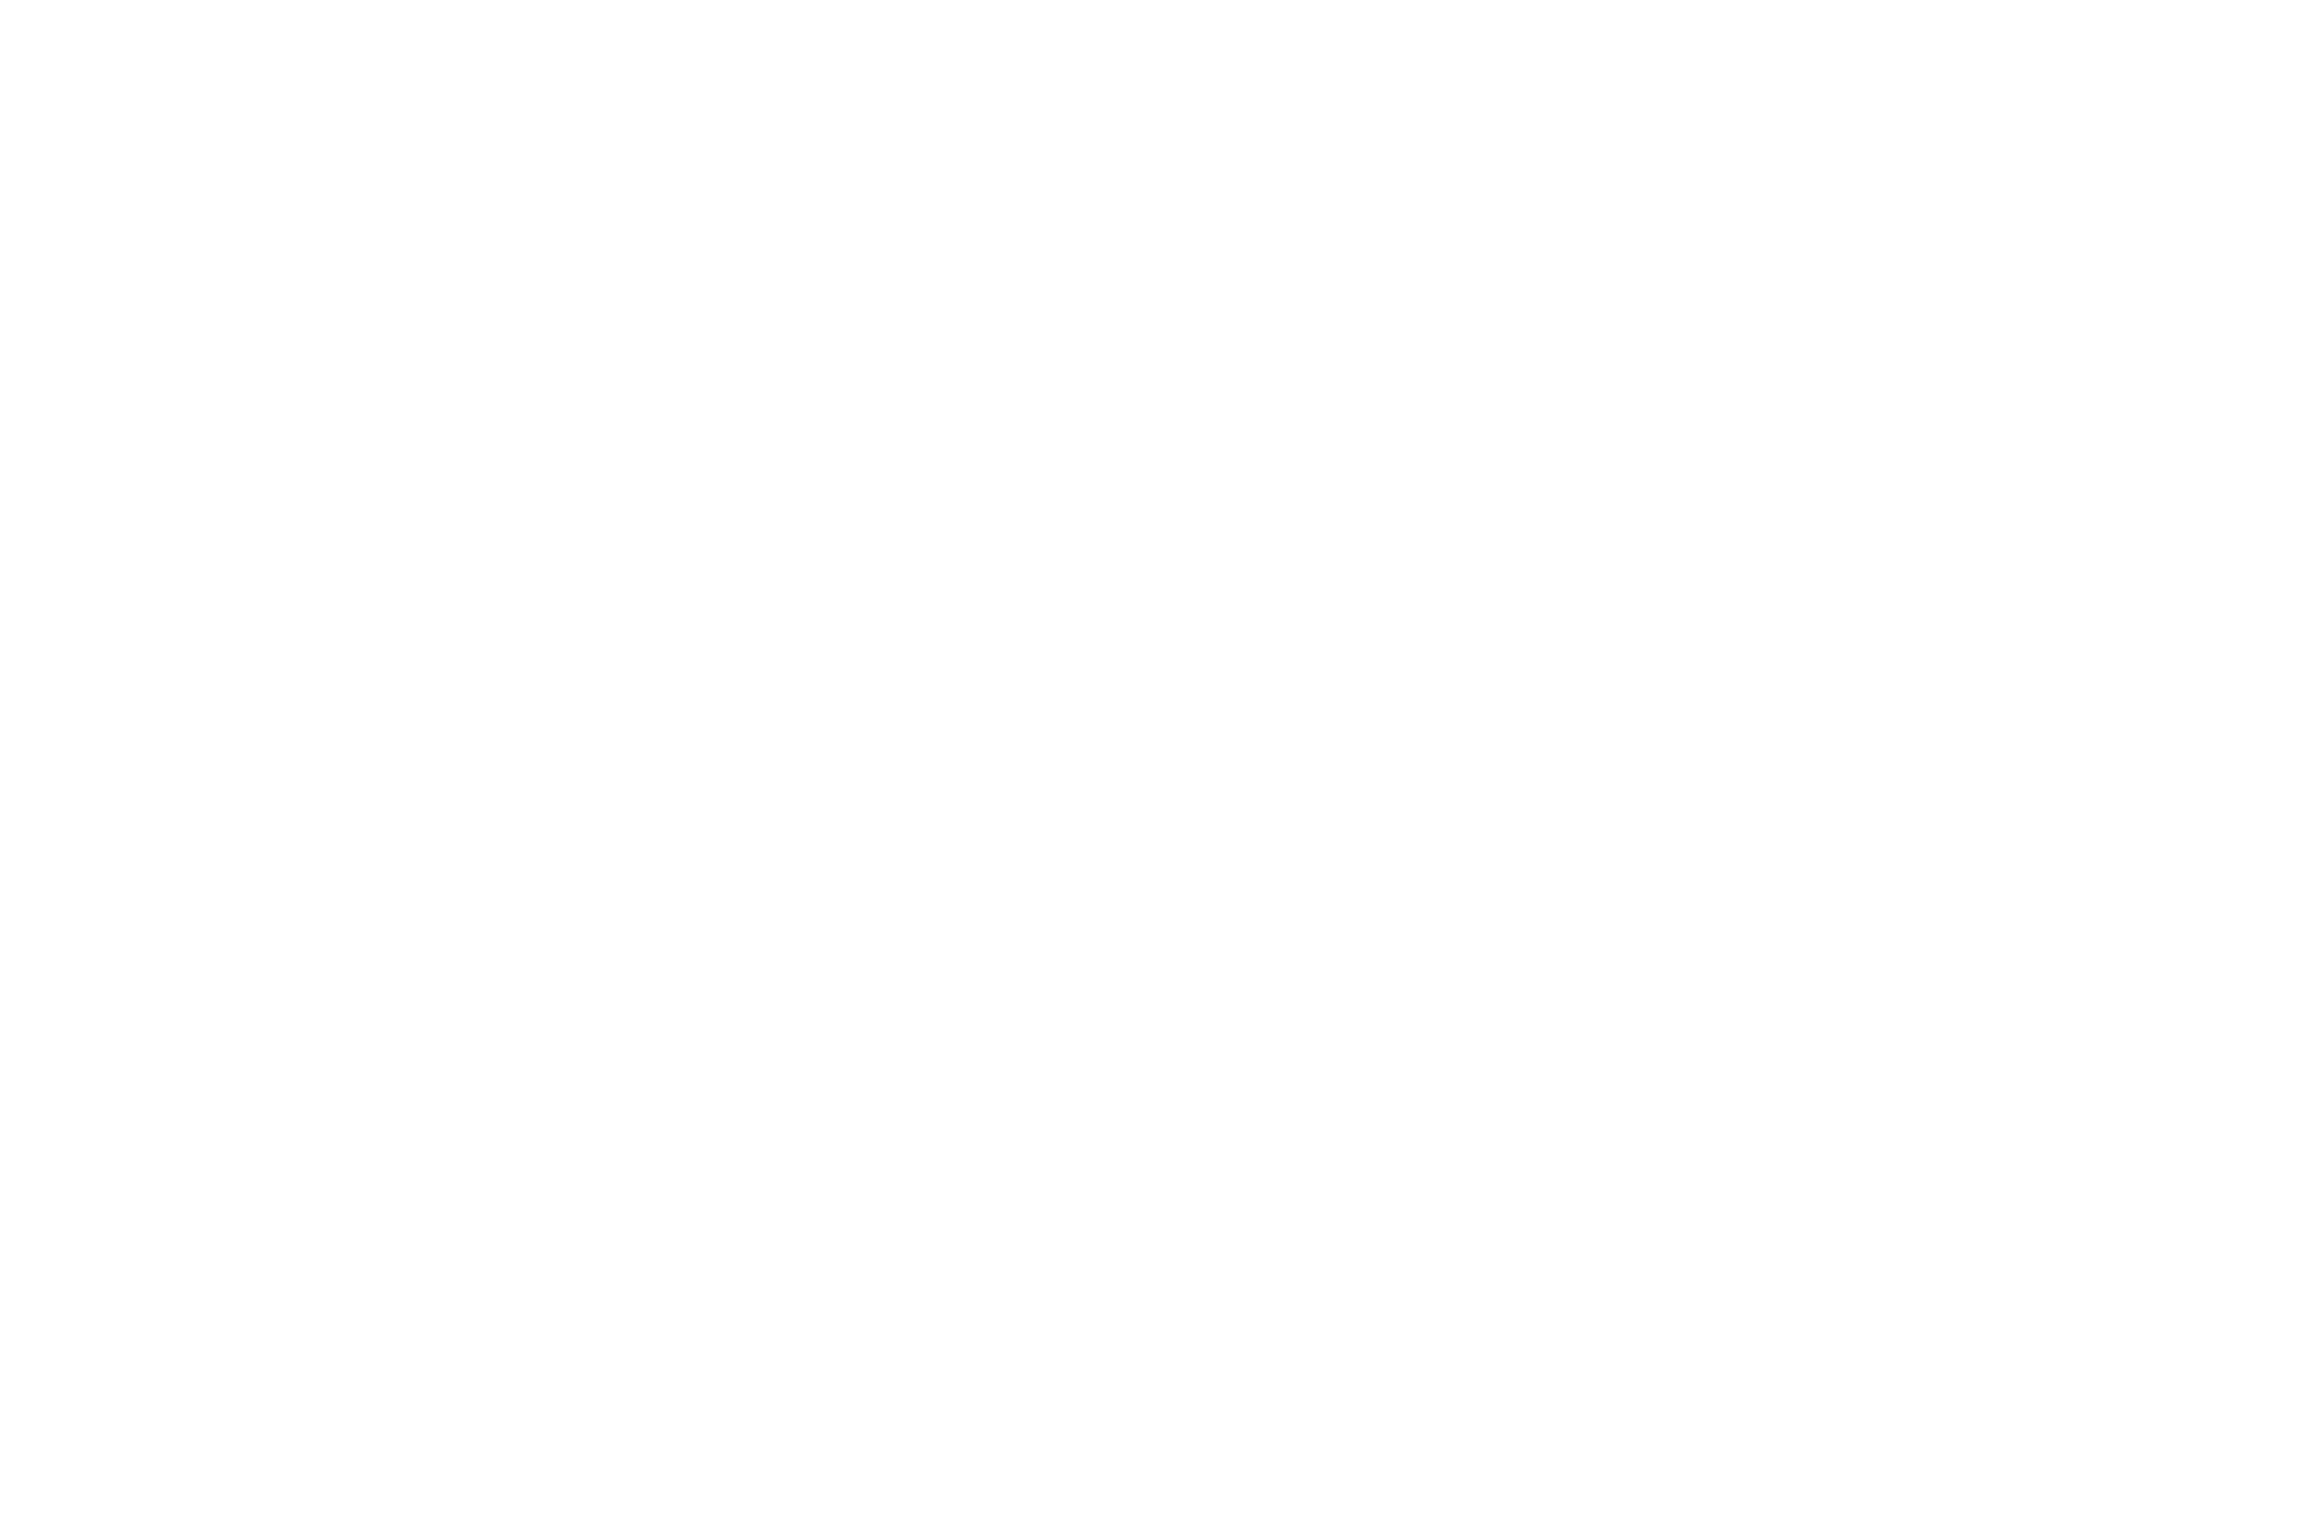 NX2A4201